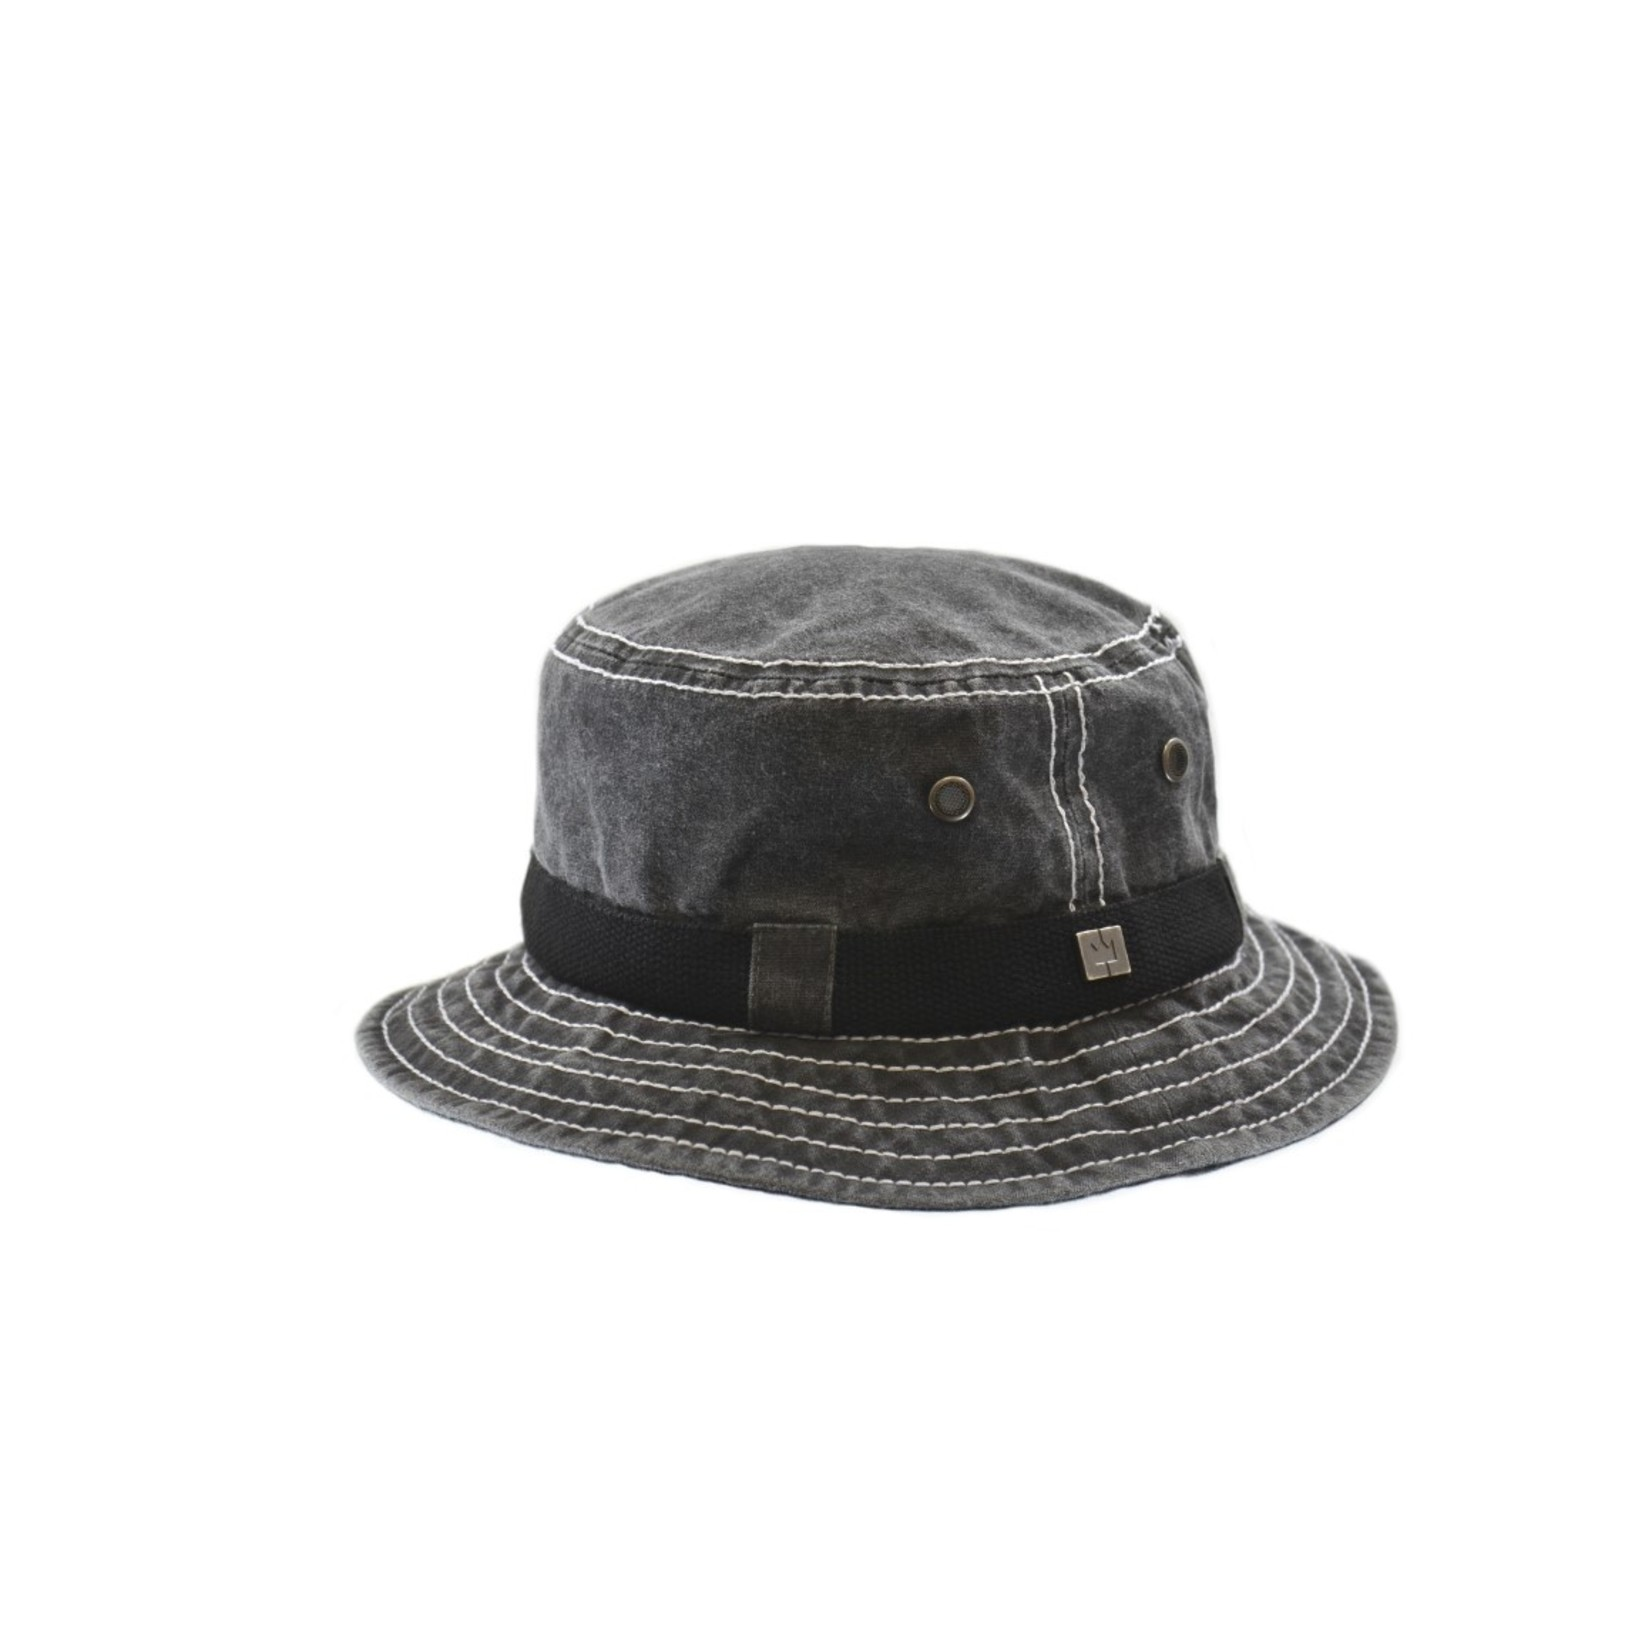 Crowncap 5-10135 Washed Pigment Dyed Bucket Hat